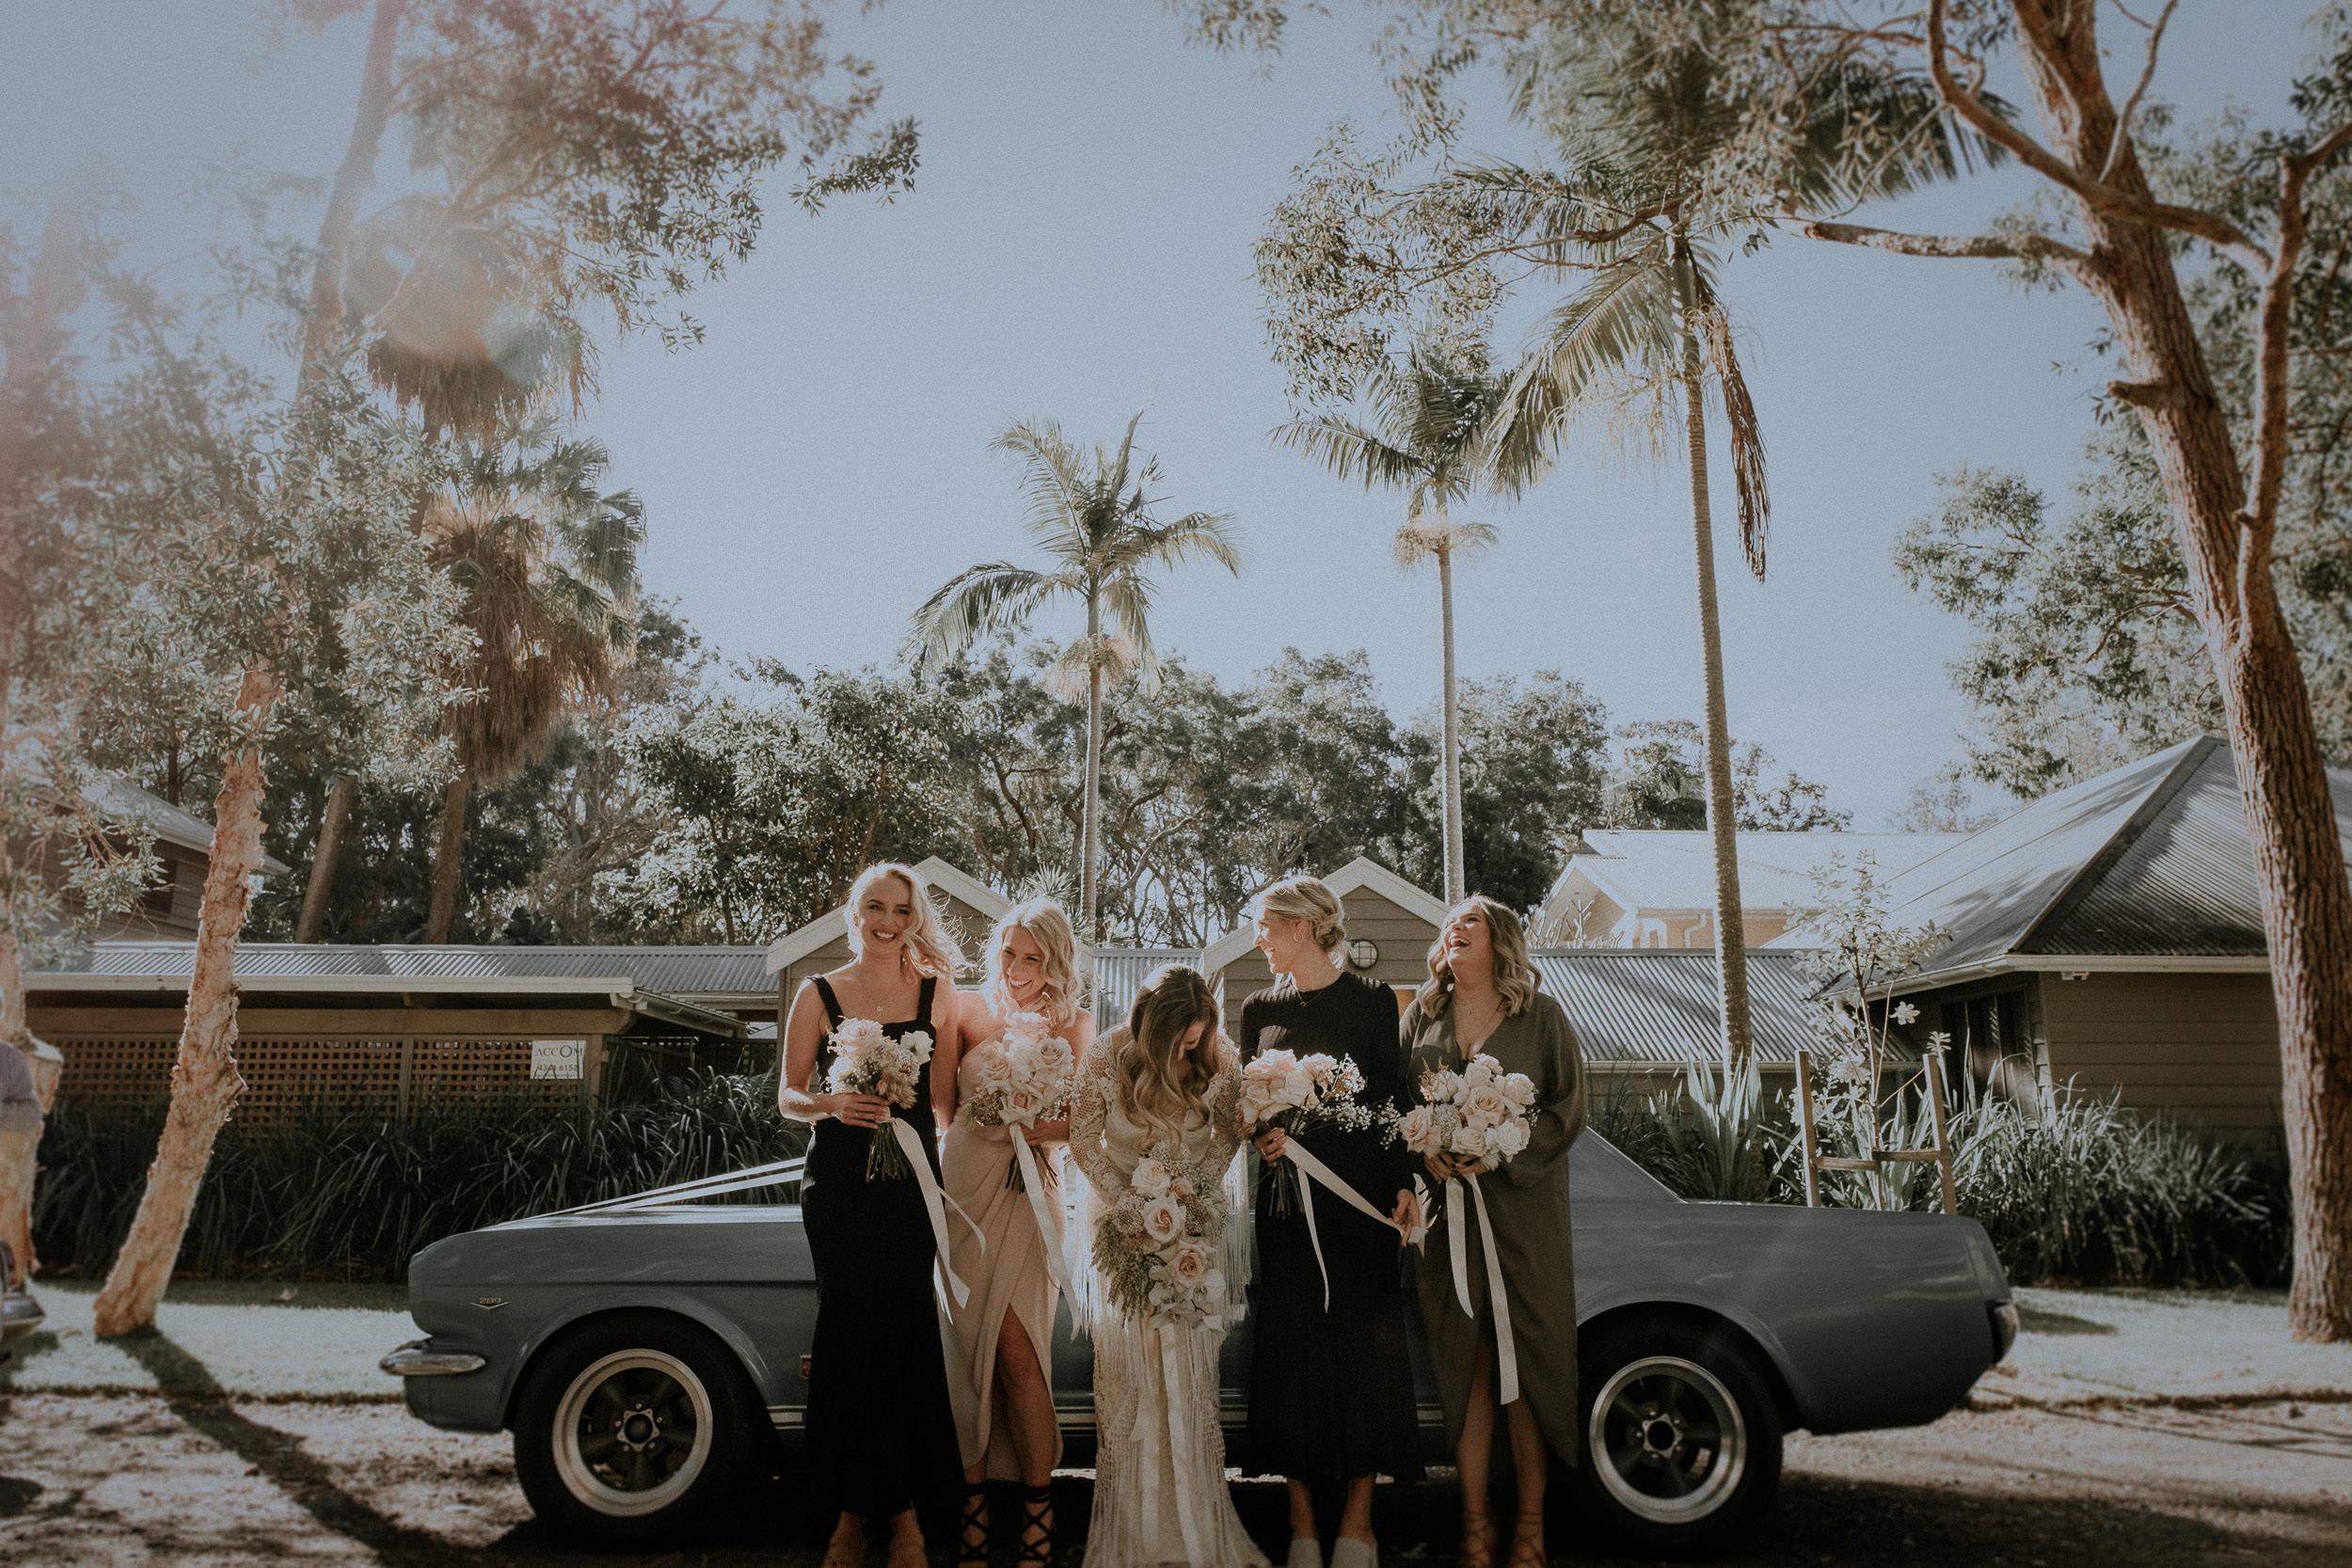 S&A Elopement - Kings & Thieves - Shred 'Til Dead - Central Coast Beach Forest Wedding - 134.jpg